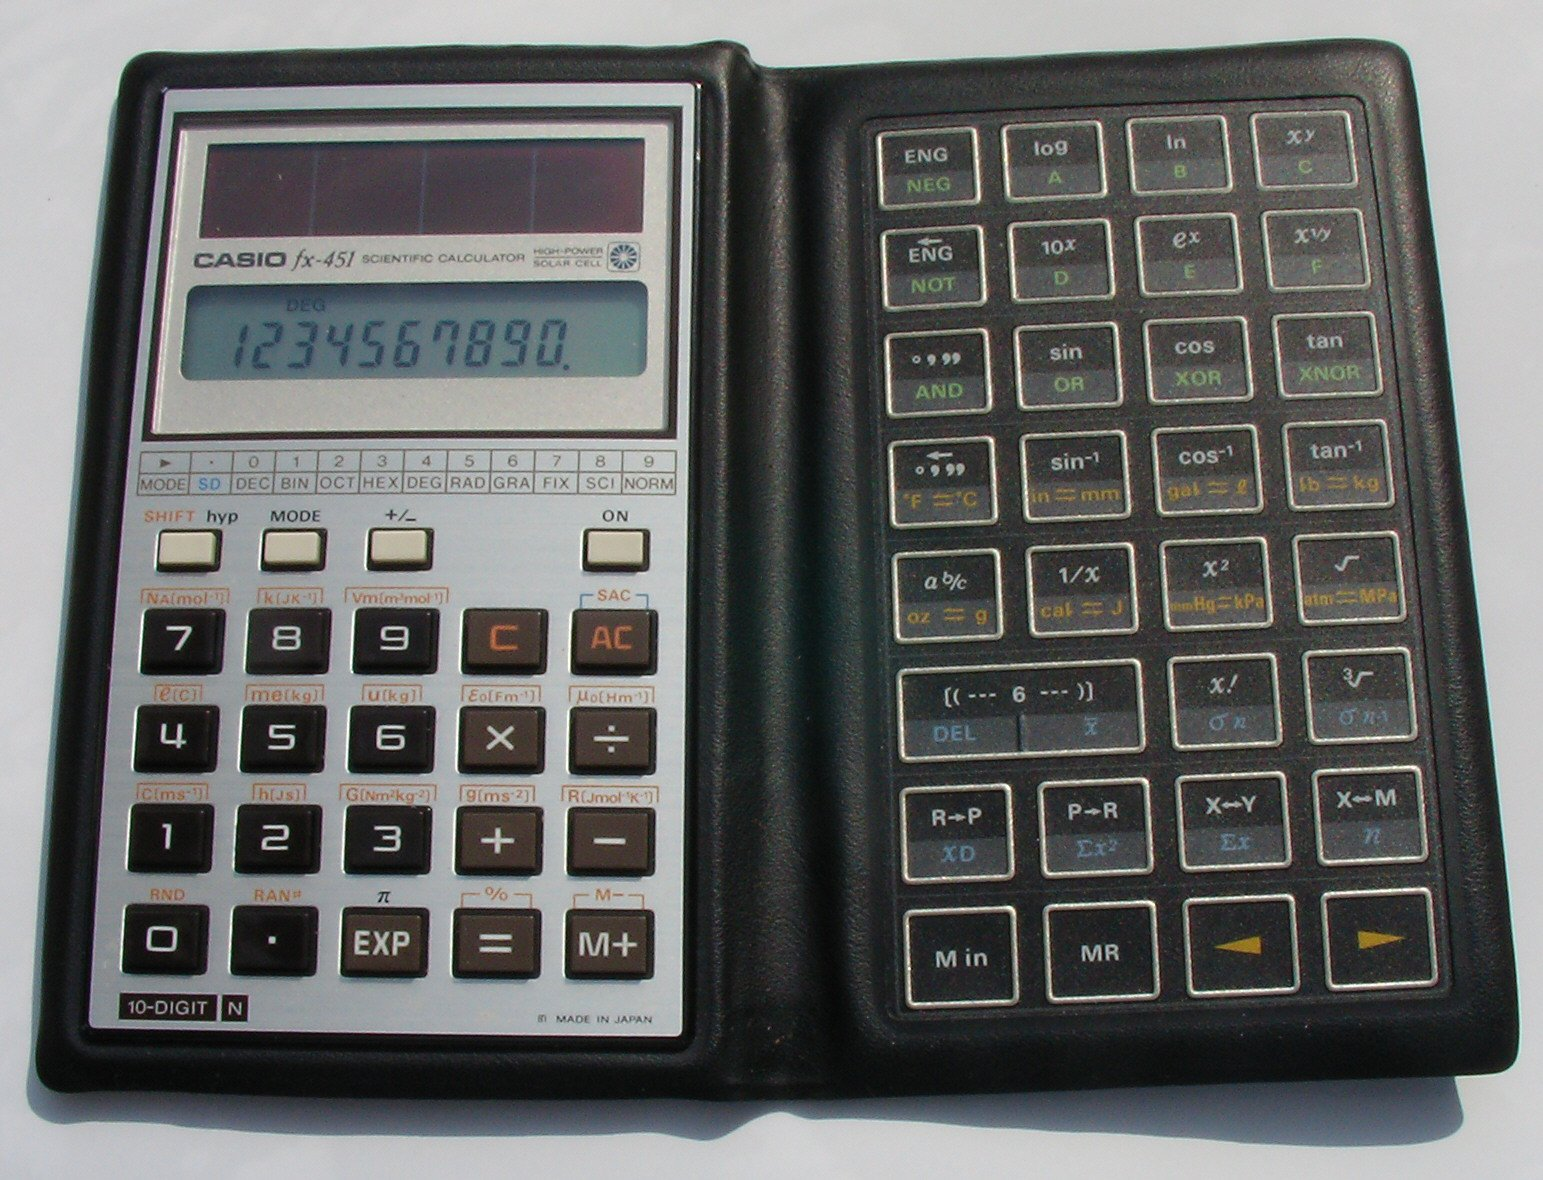 Vintage casio fx-451 scientific calculator boxed manual mint.